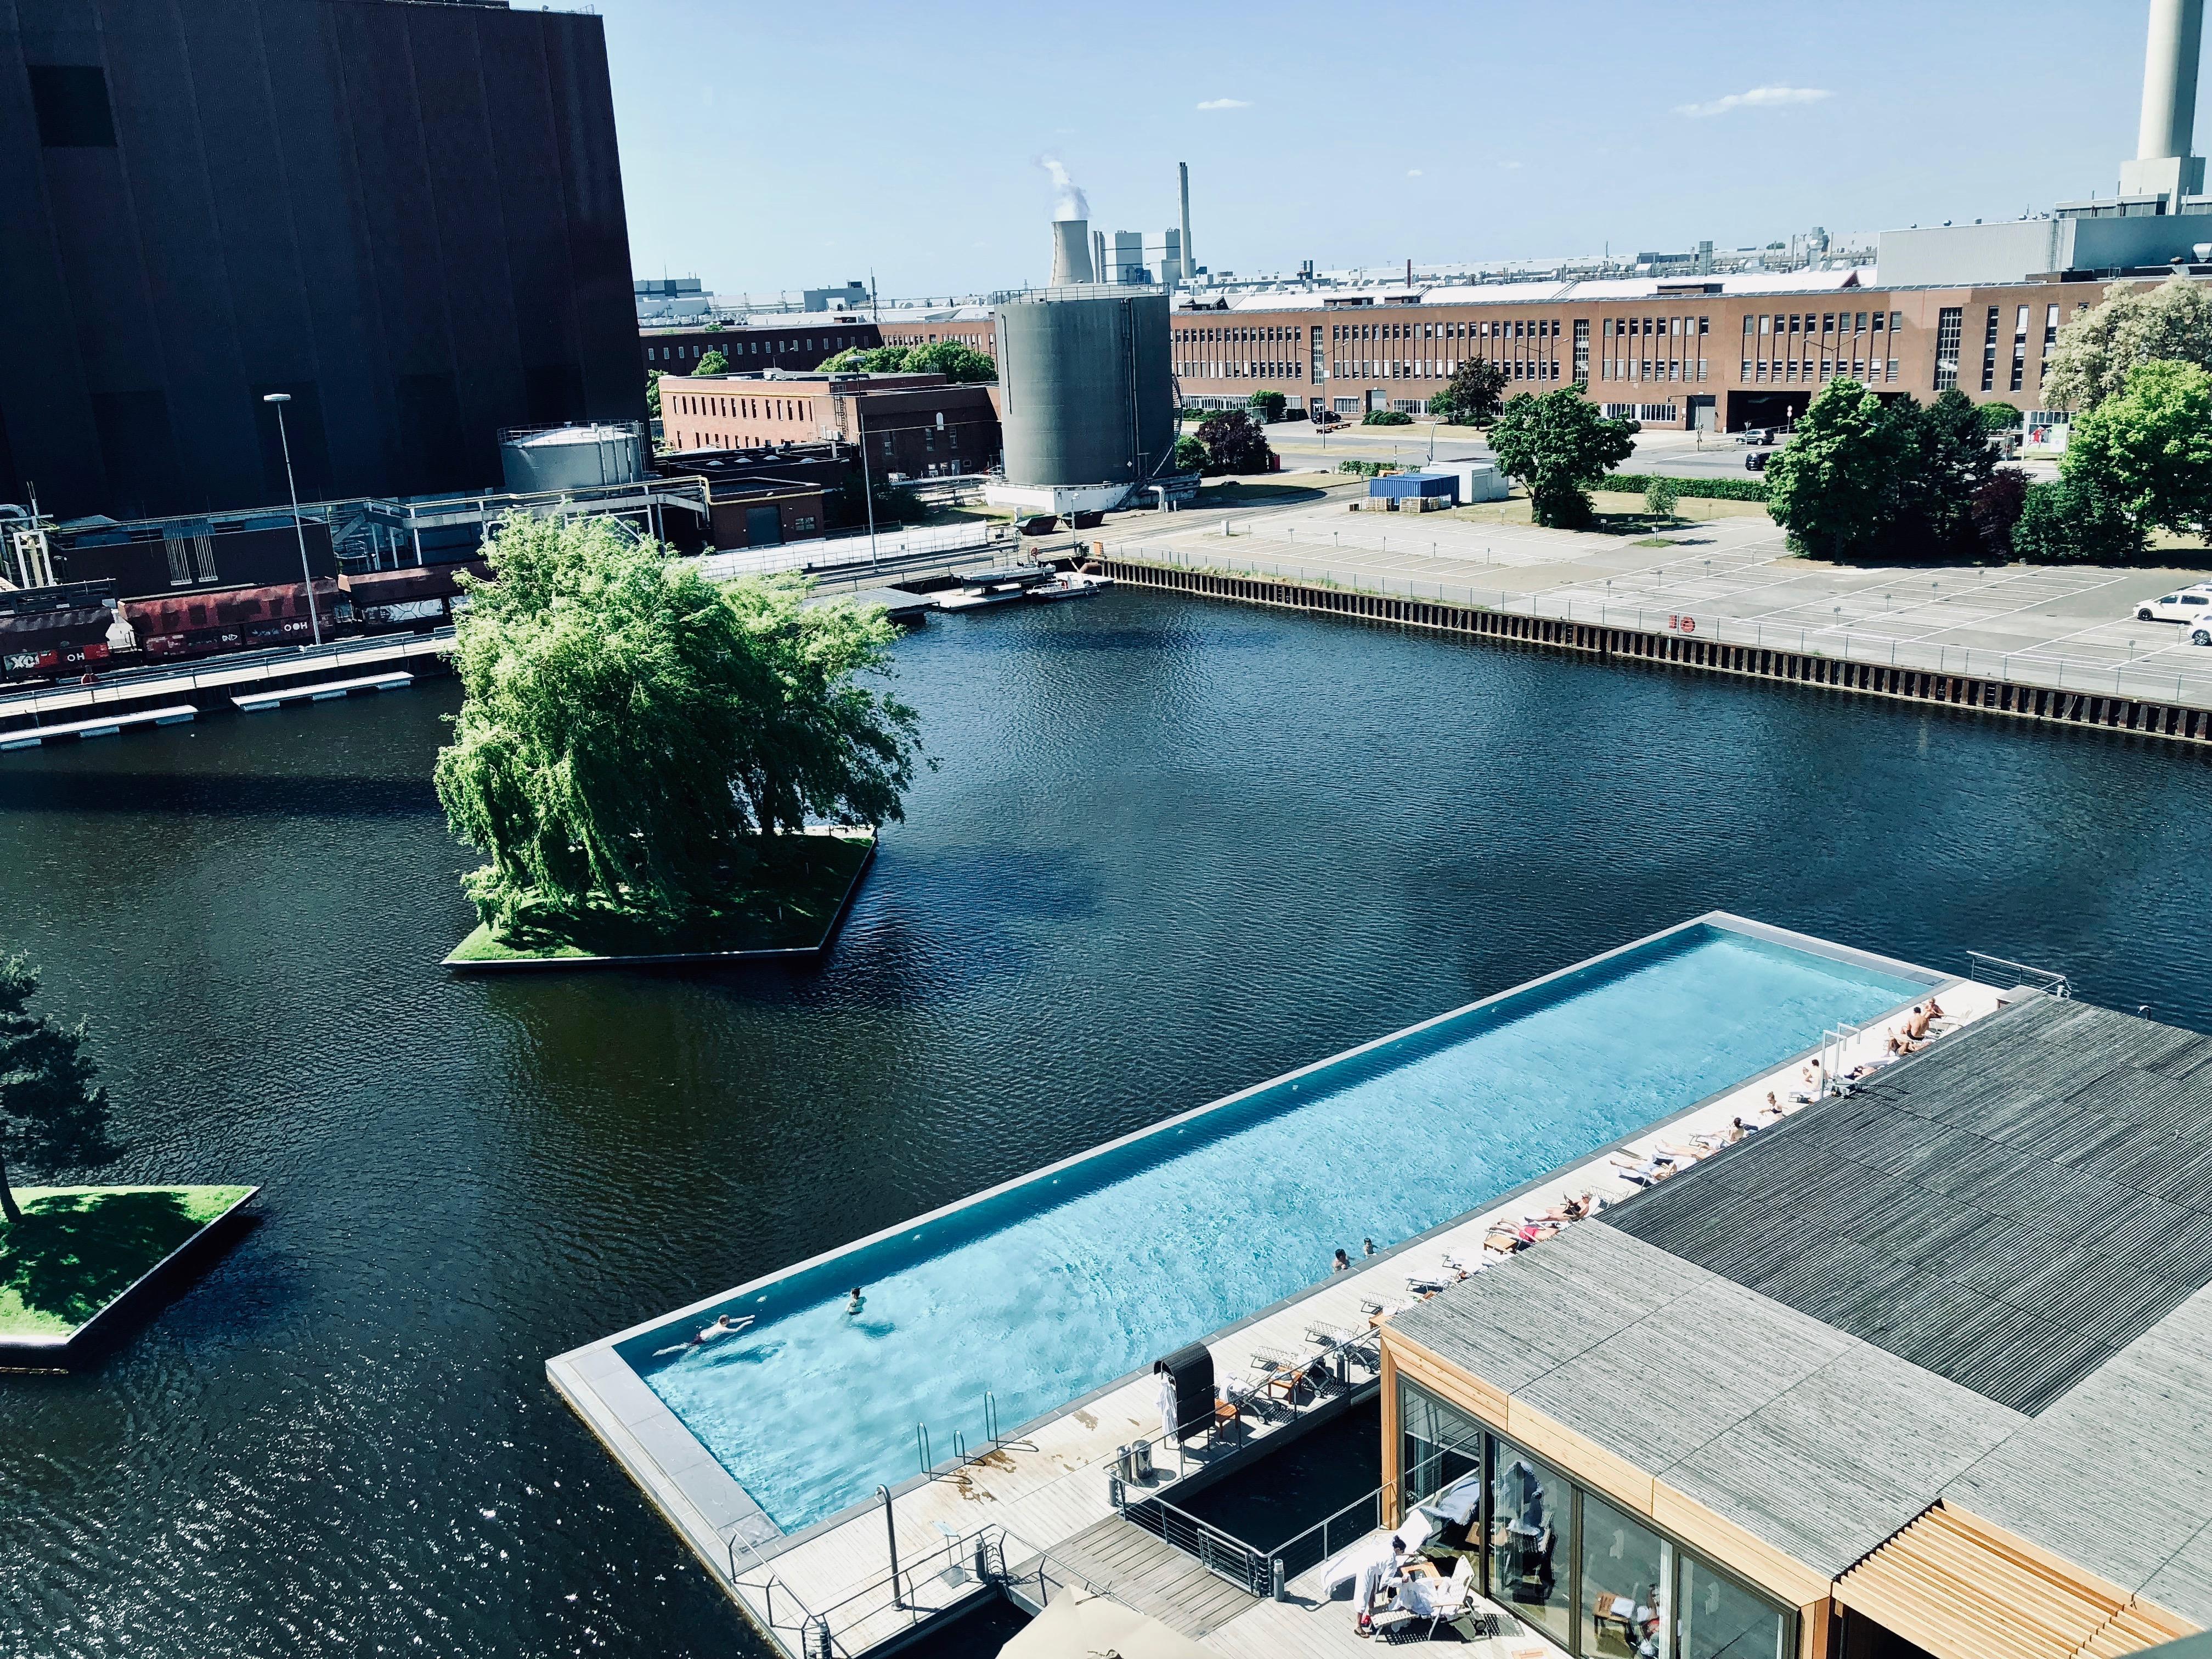 The Ritz-Carlton Wolfsburg Pool